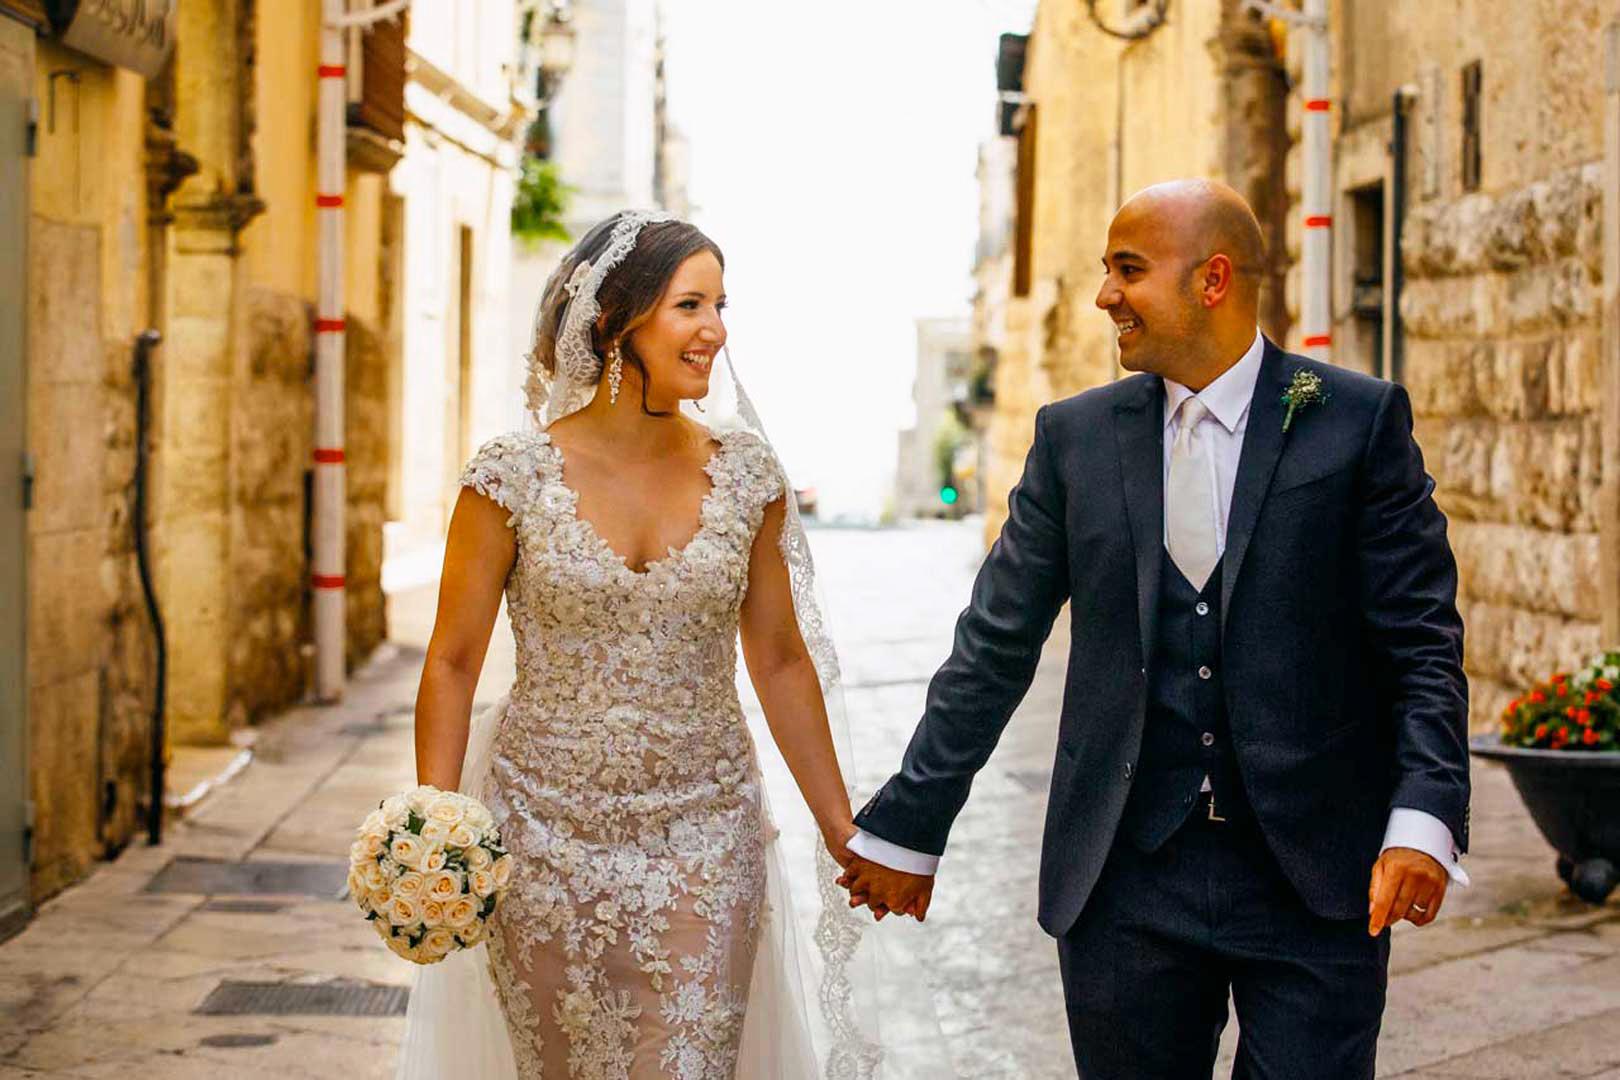 026-altamura-wedding-gianni-lepore-photographer